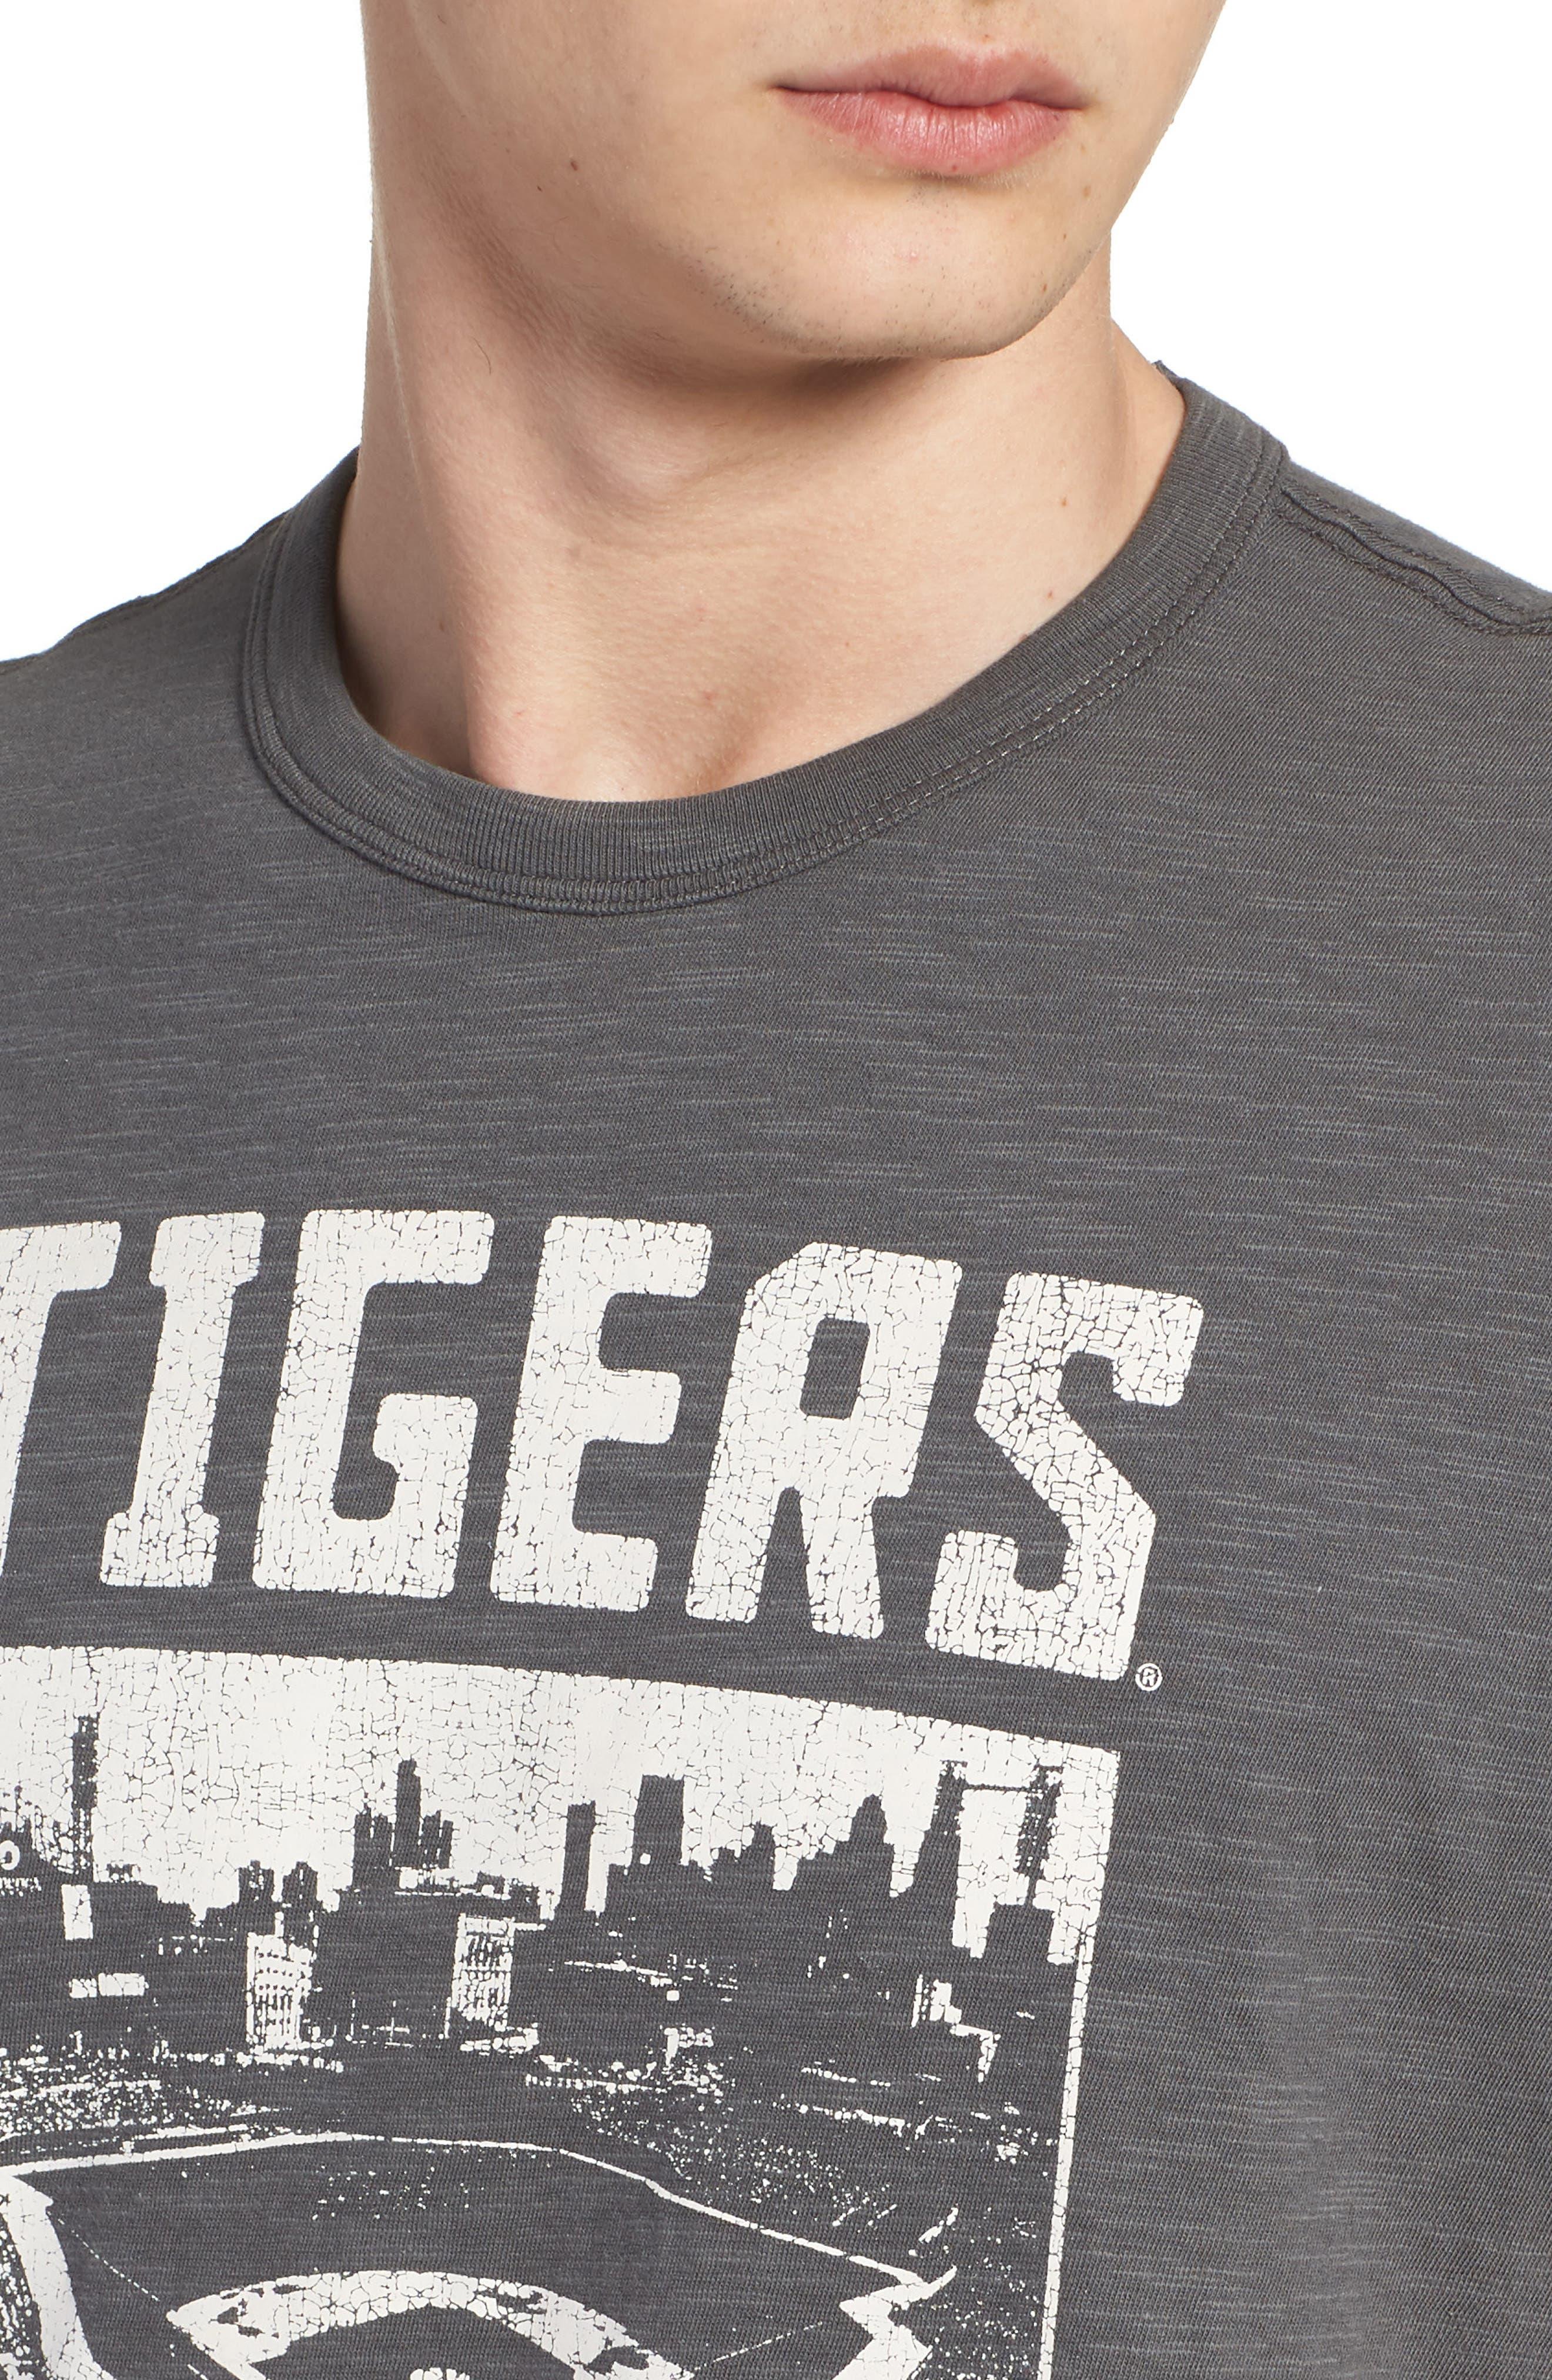 MLB Overdrive Scrum Detroit Tigers T-Shirt,                             Alternate thumbnail 4, color,                             020